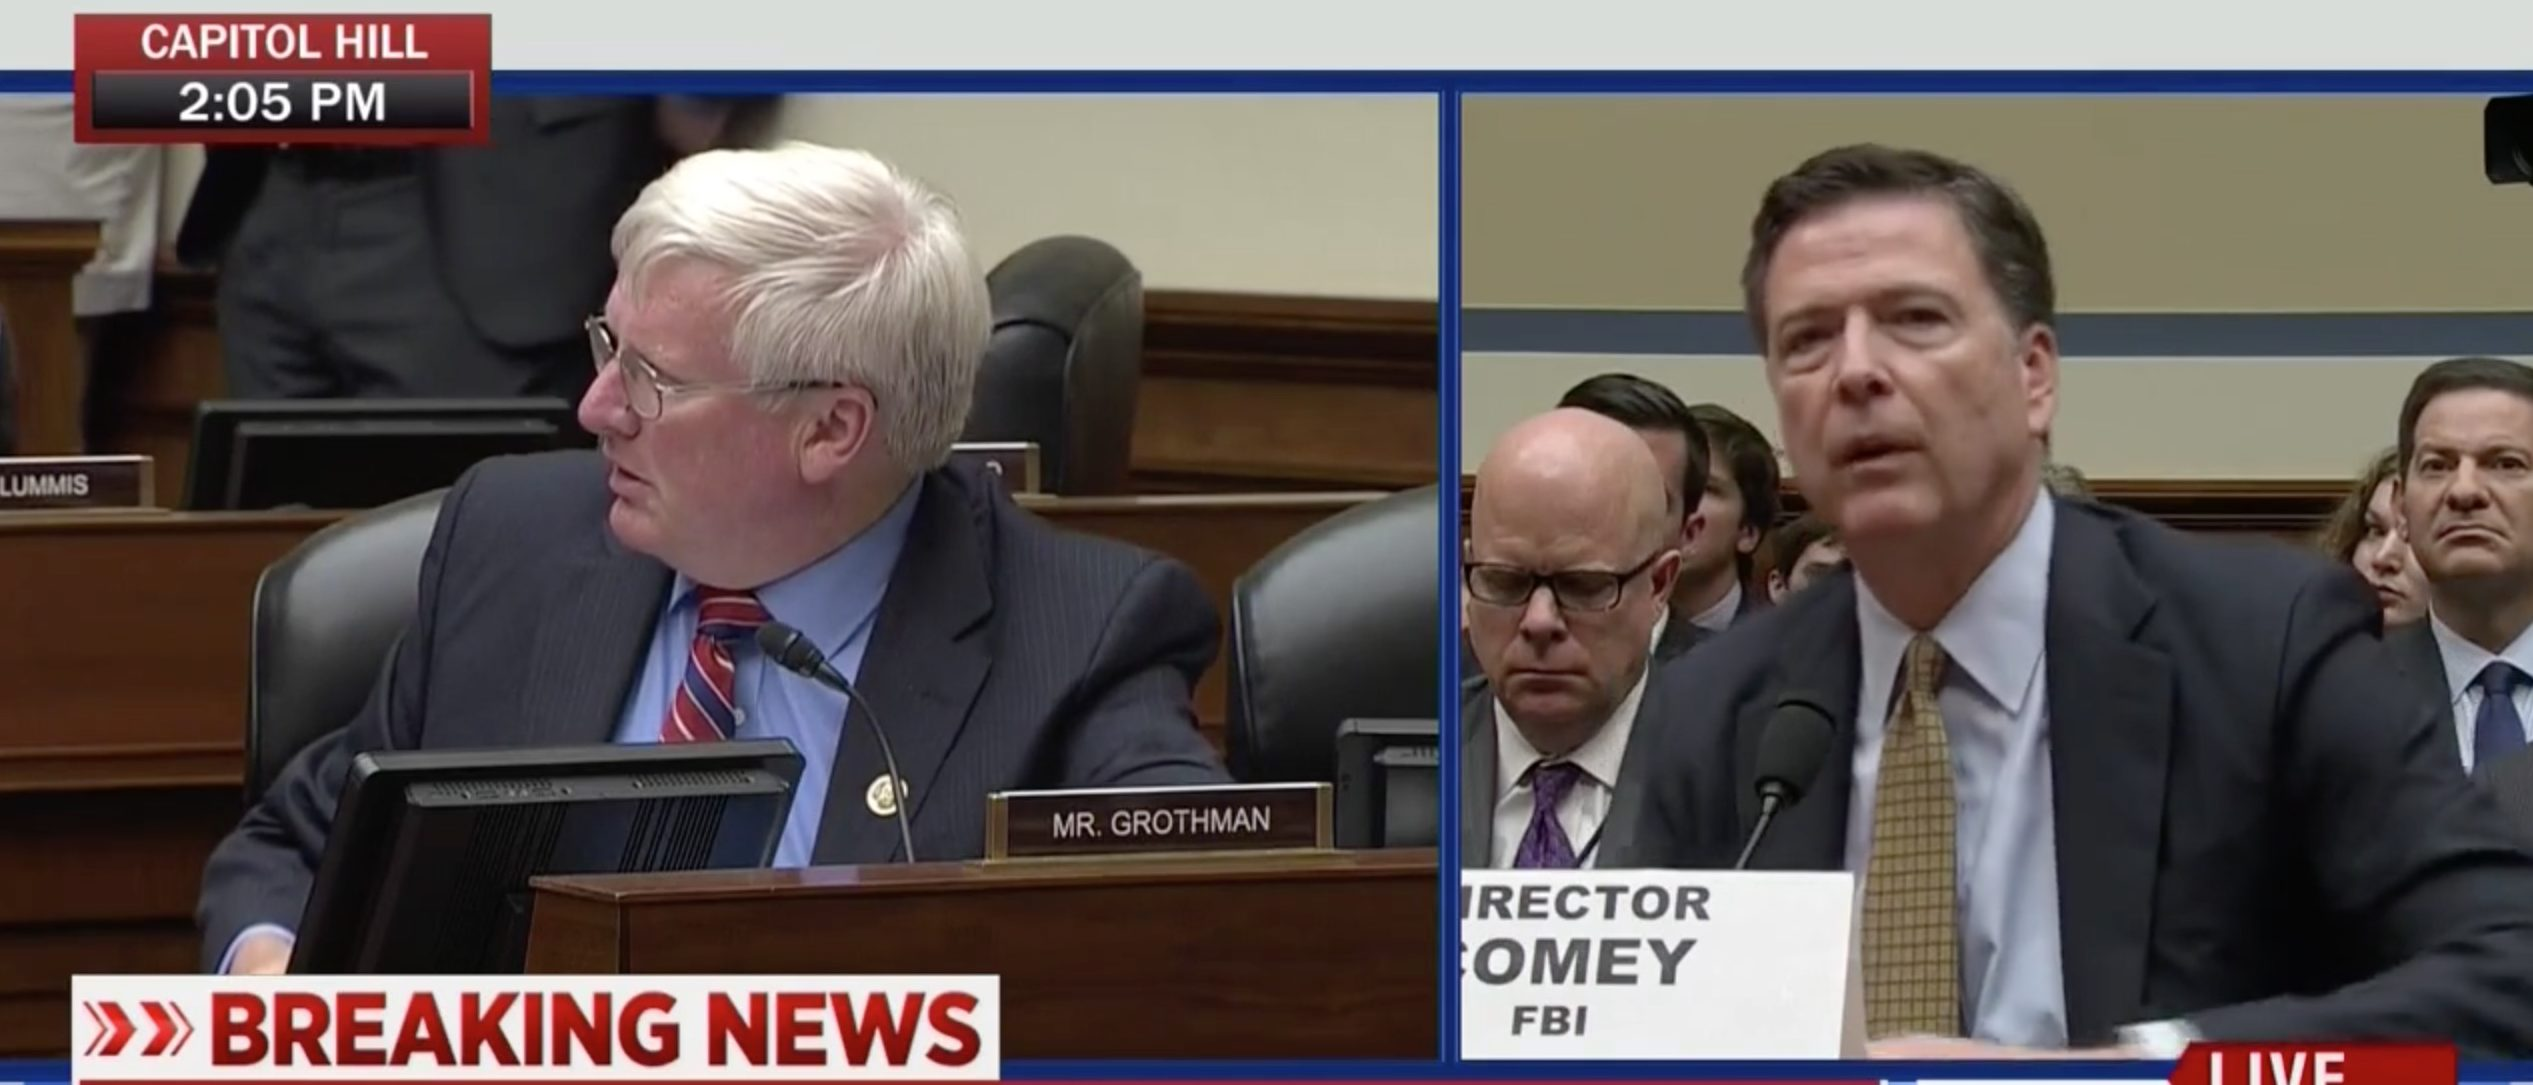 Rep. Glenn Grothman, James Comey, Screen Grab MSNBC 7-7-2016